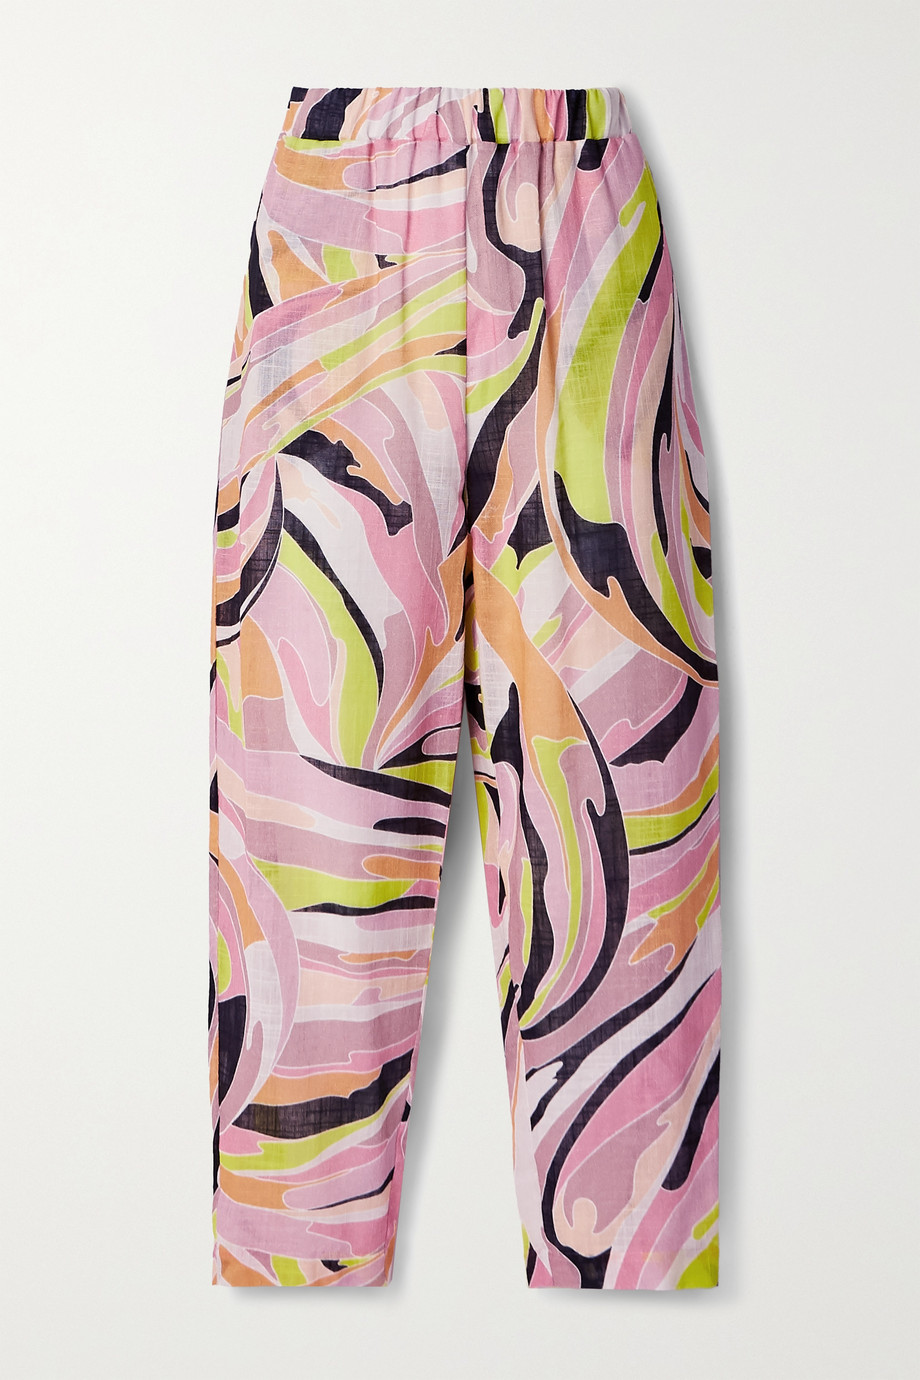 Emilio Pucci Printed cotton-gauze straight-leg pants